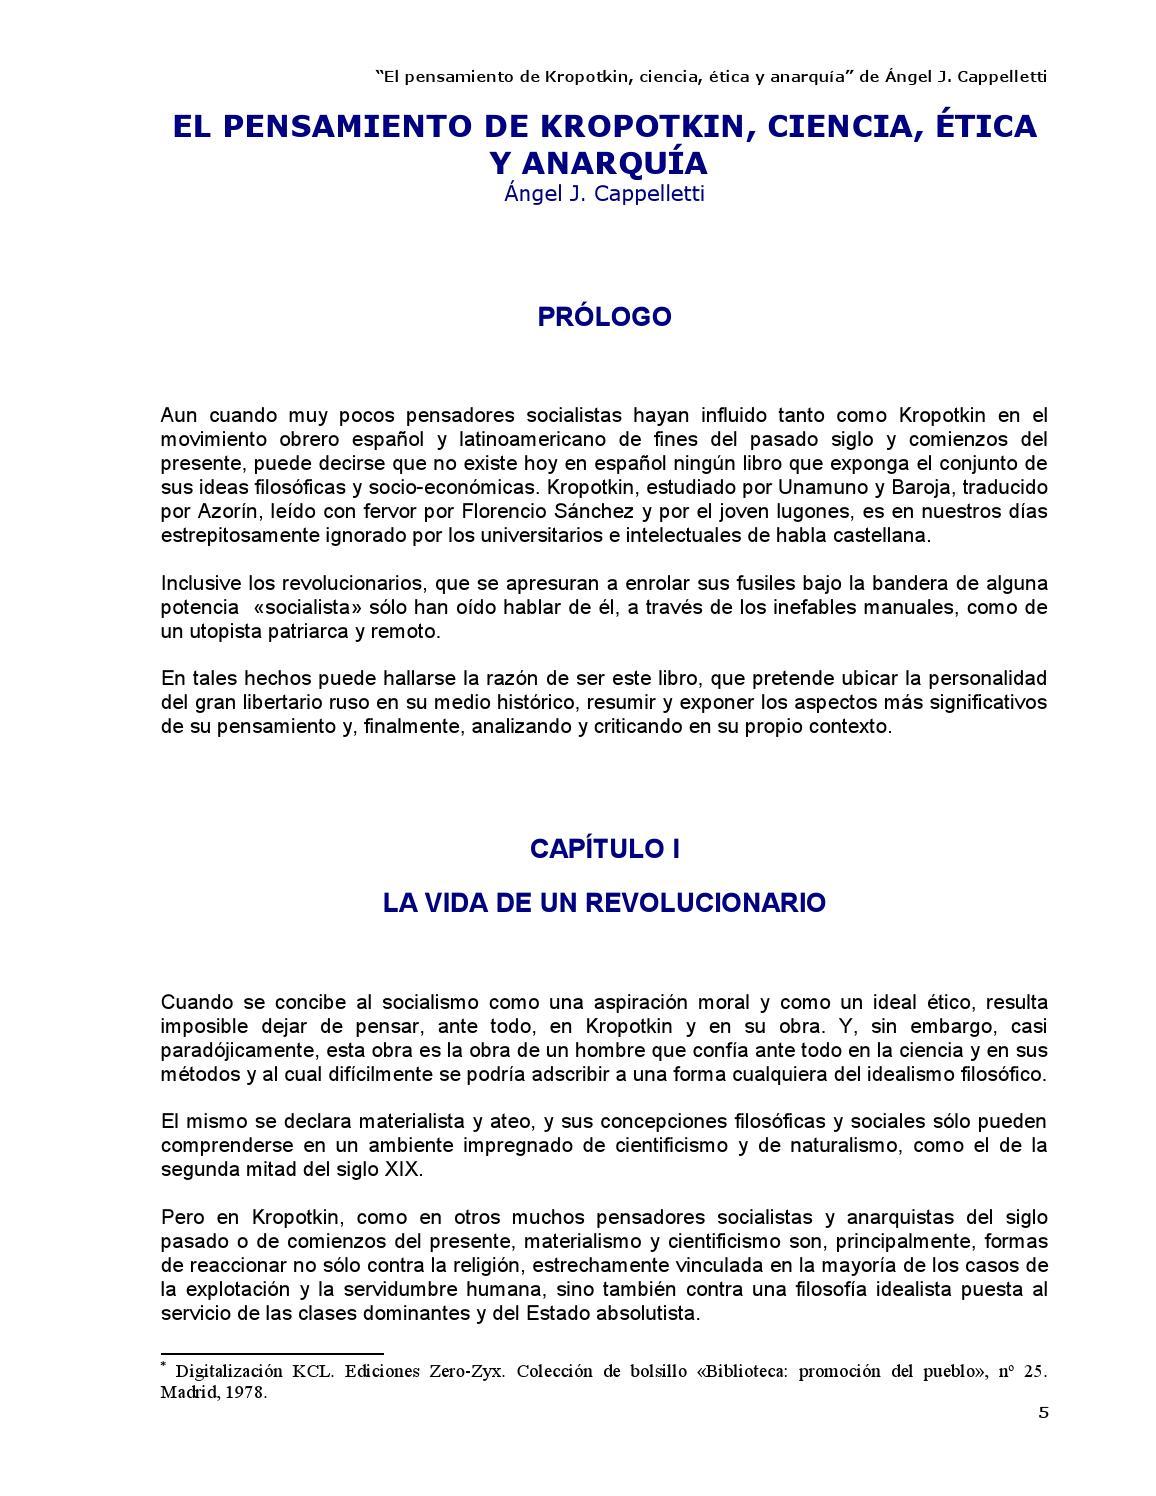 El pensamiento de Kropotkin - Ángel J. Cappelletti by Kclibertaria ...